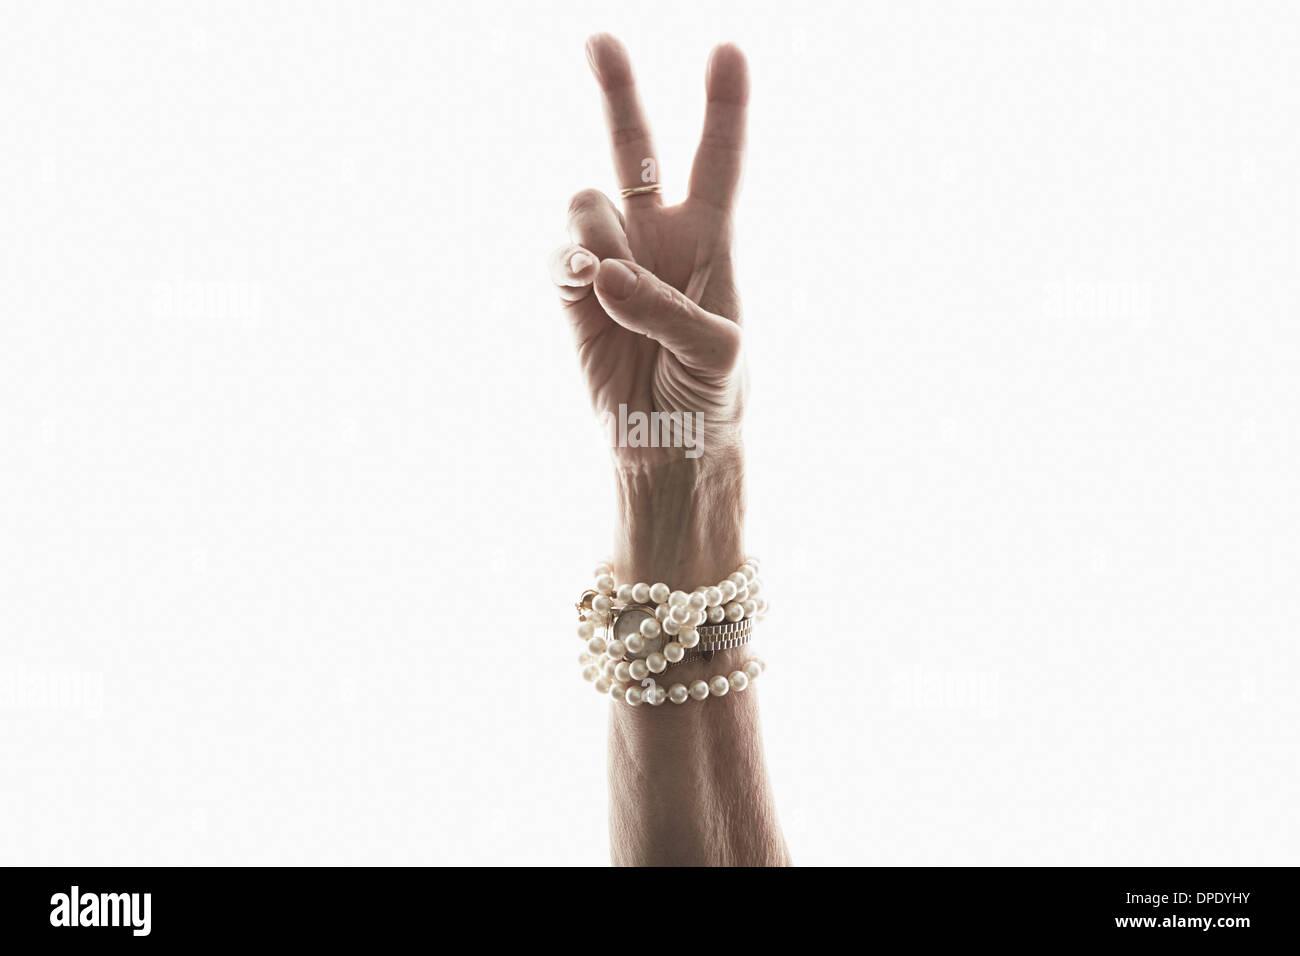 Studio shot of mature woman's hand making peace gesture - Stock Image